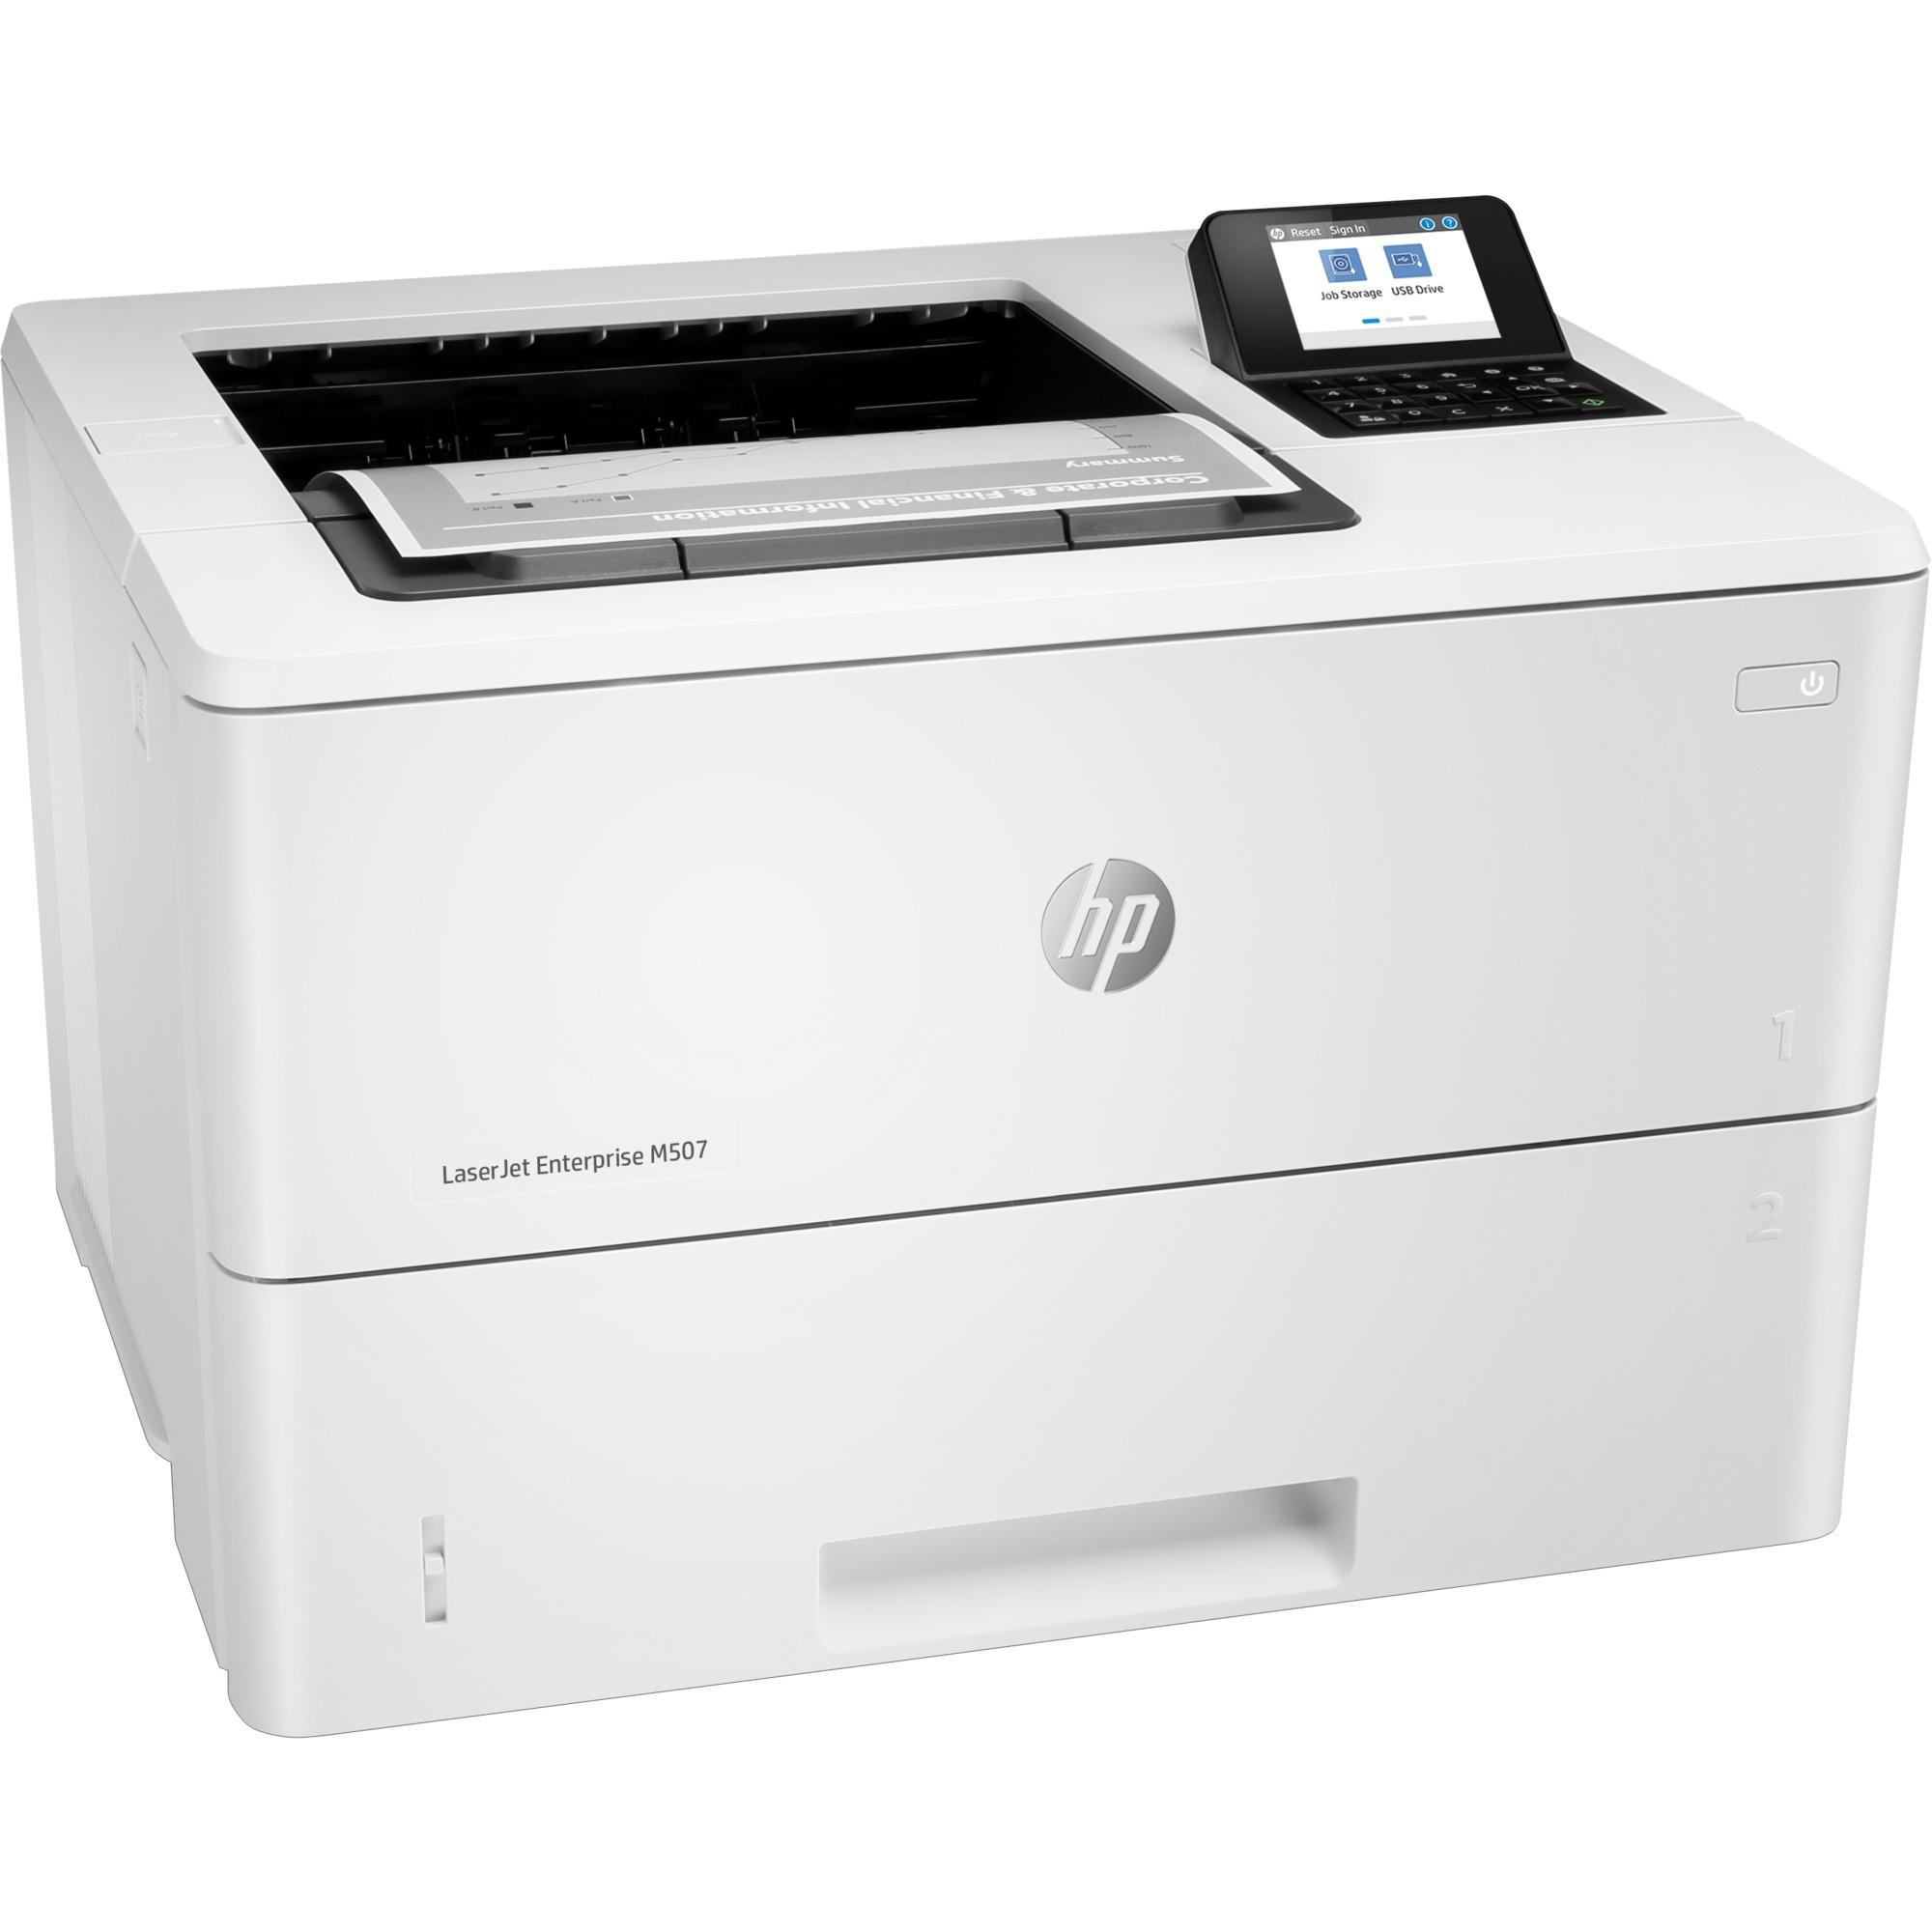 LaserJet Enterprise M507dn 1200 x 1200 DPI A4, Impresora láser